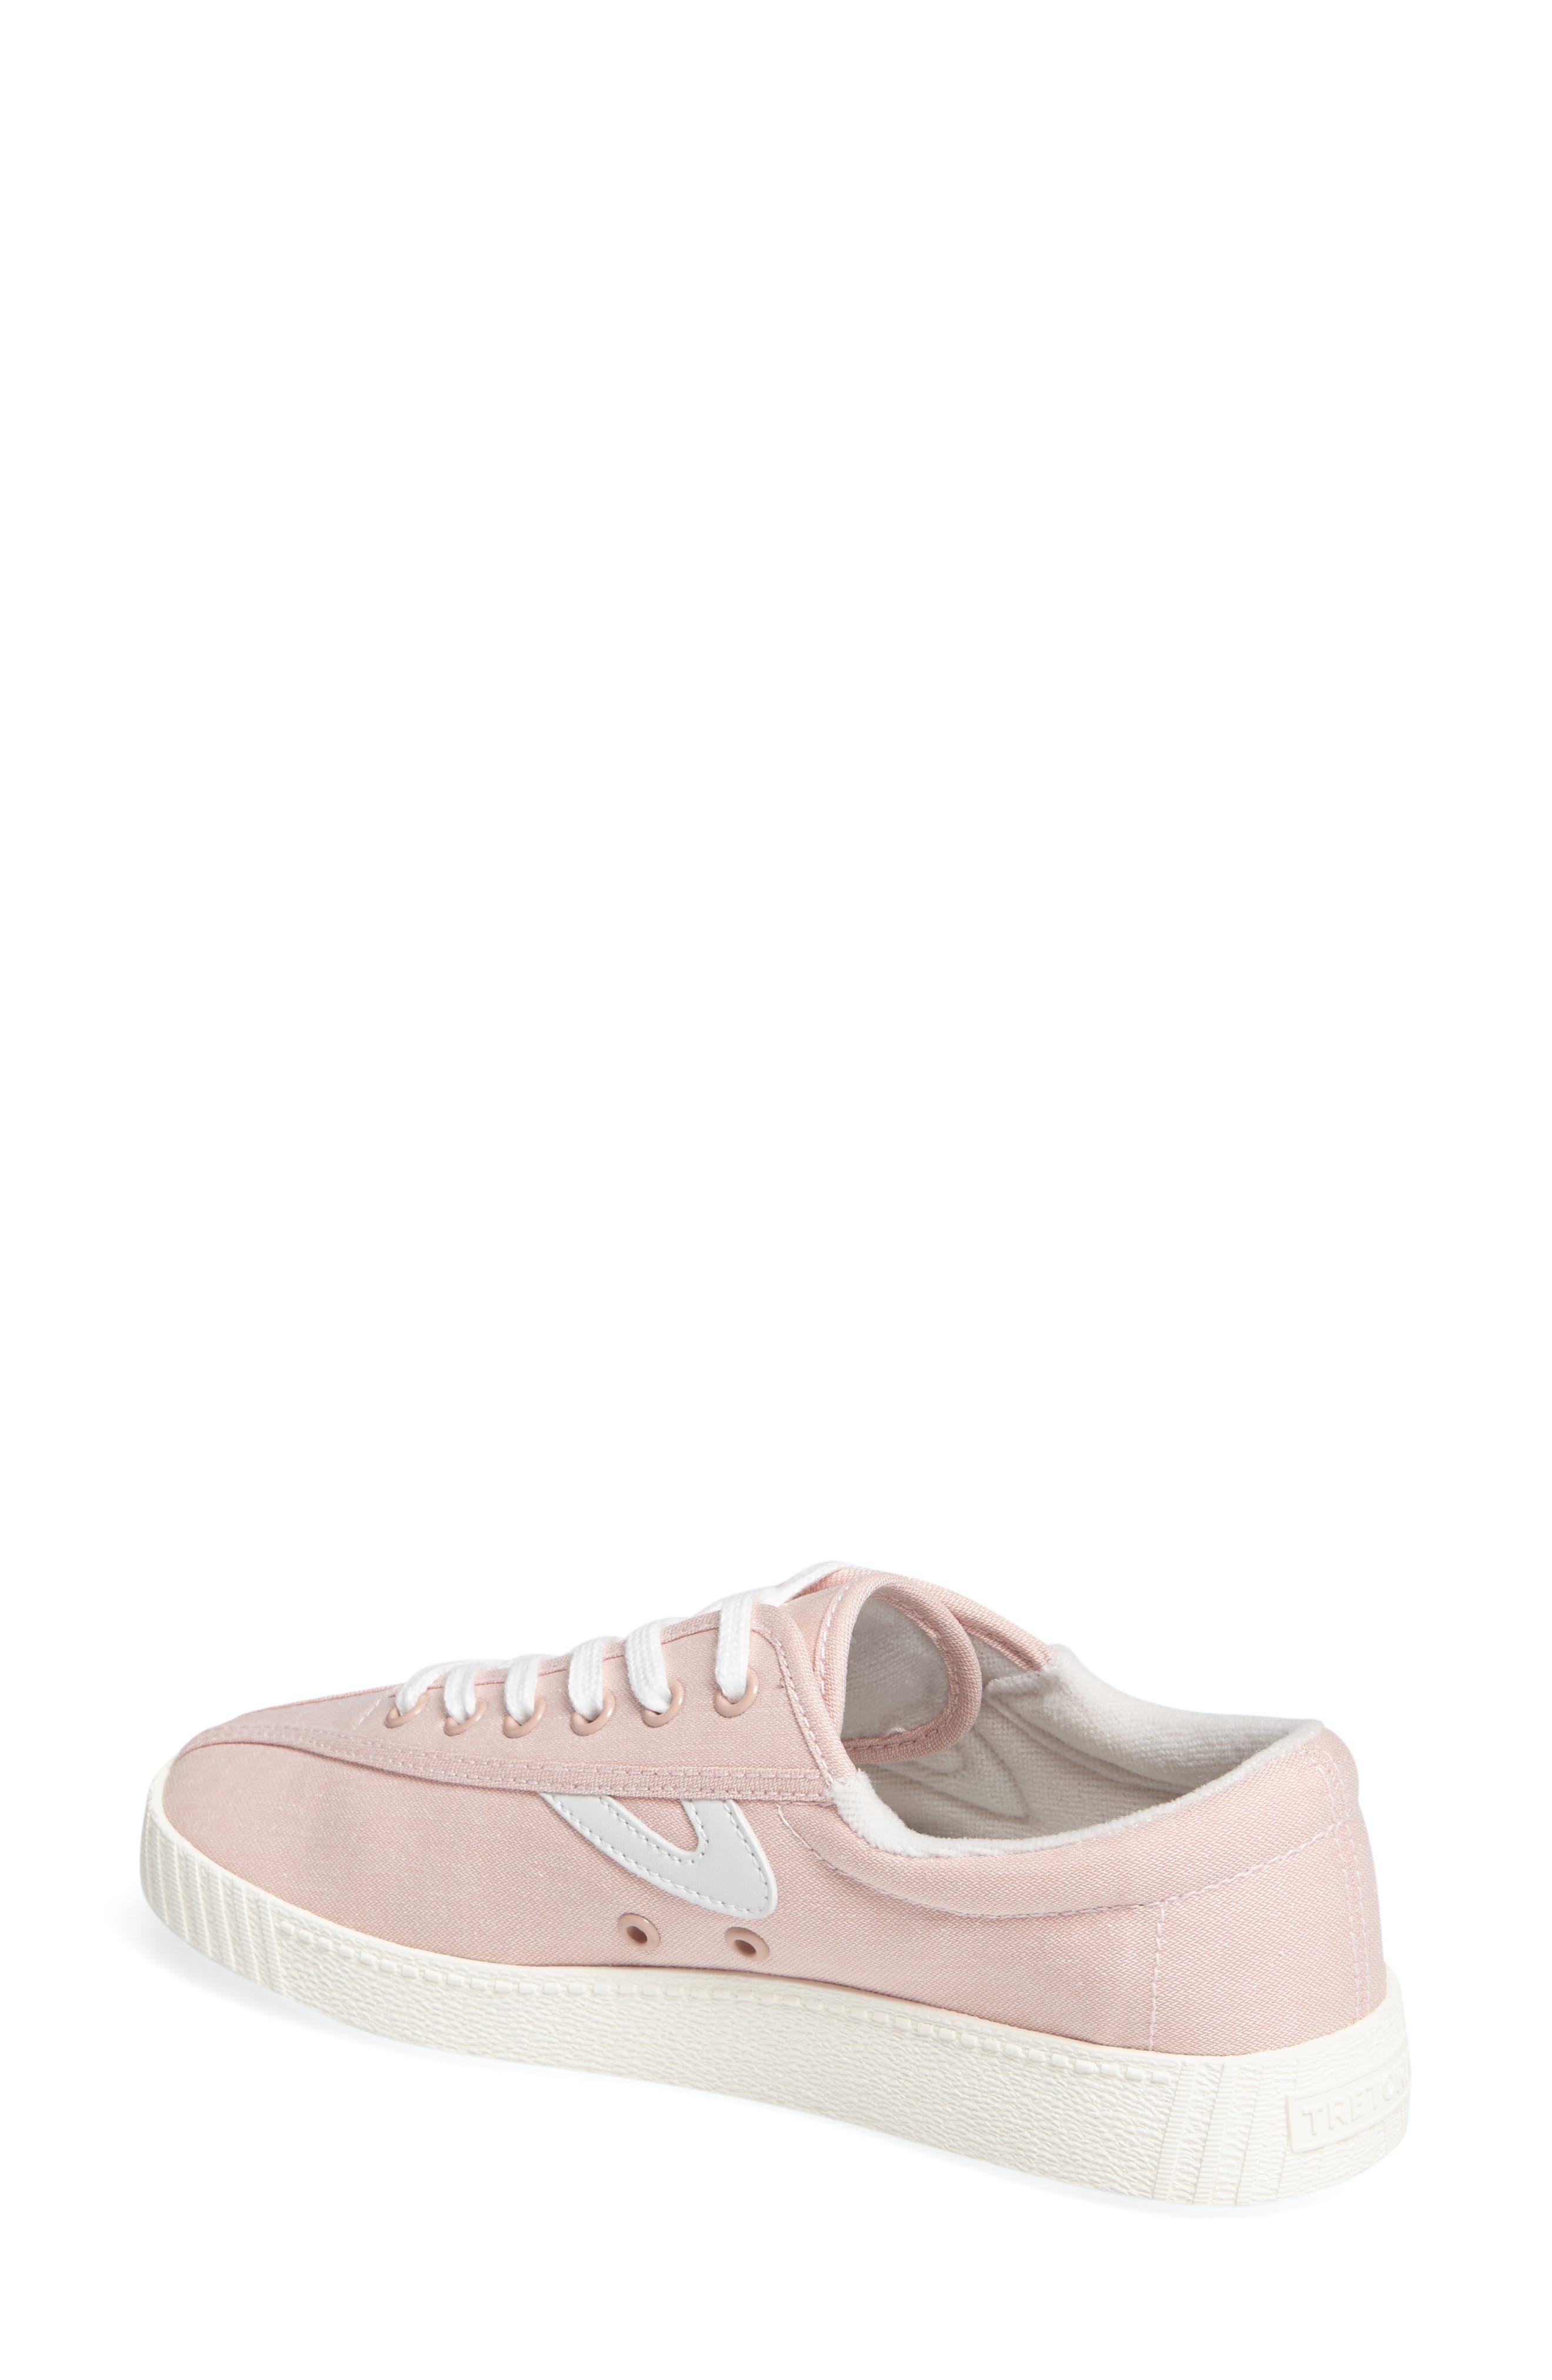 ,                             'Nylite' Sneaker,                             Alternate thumbnail 57, color,                             680